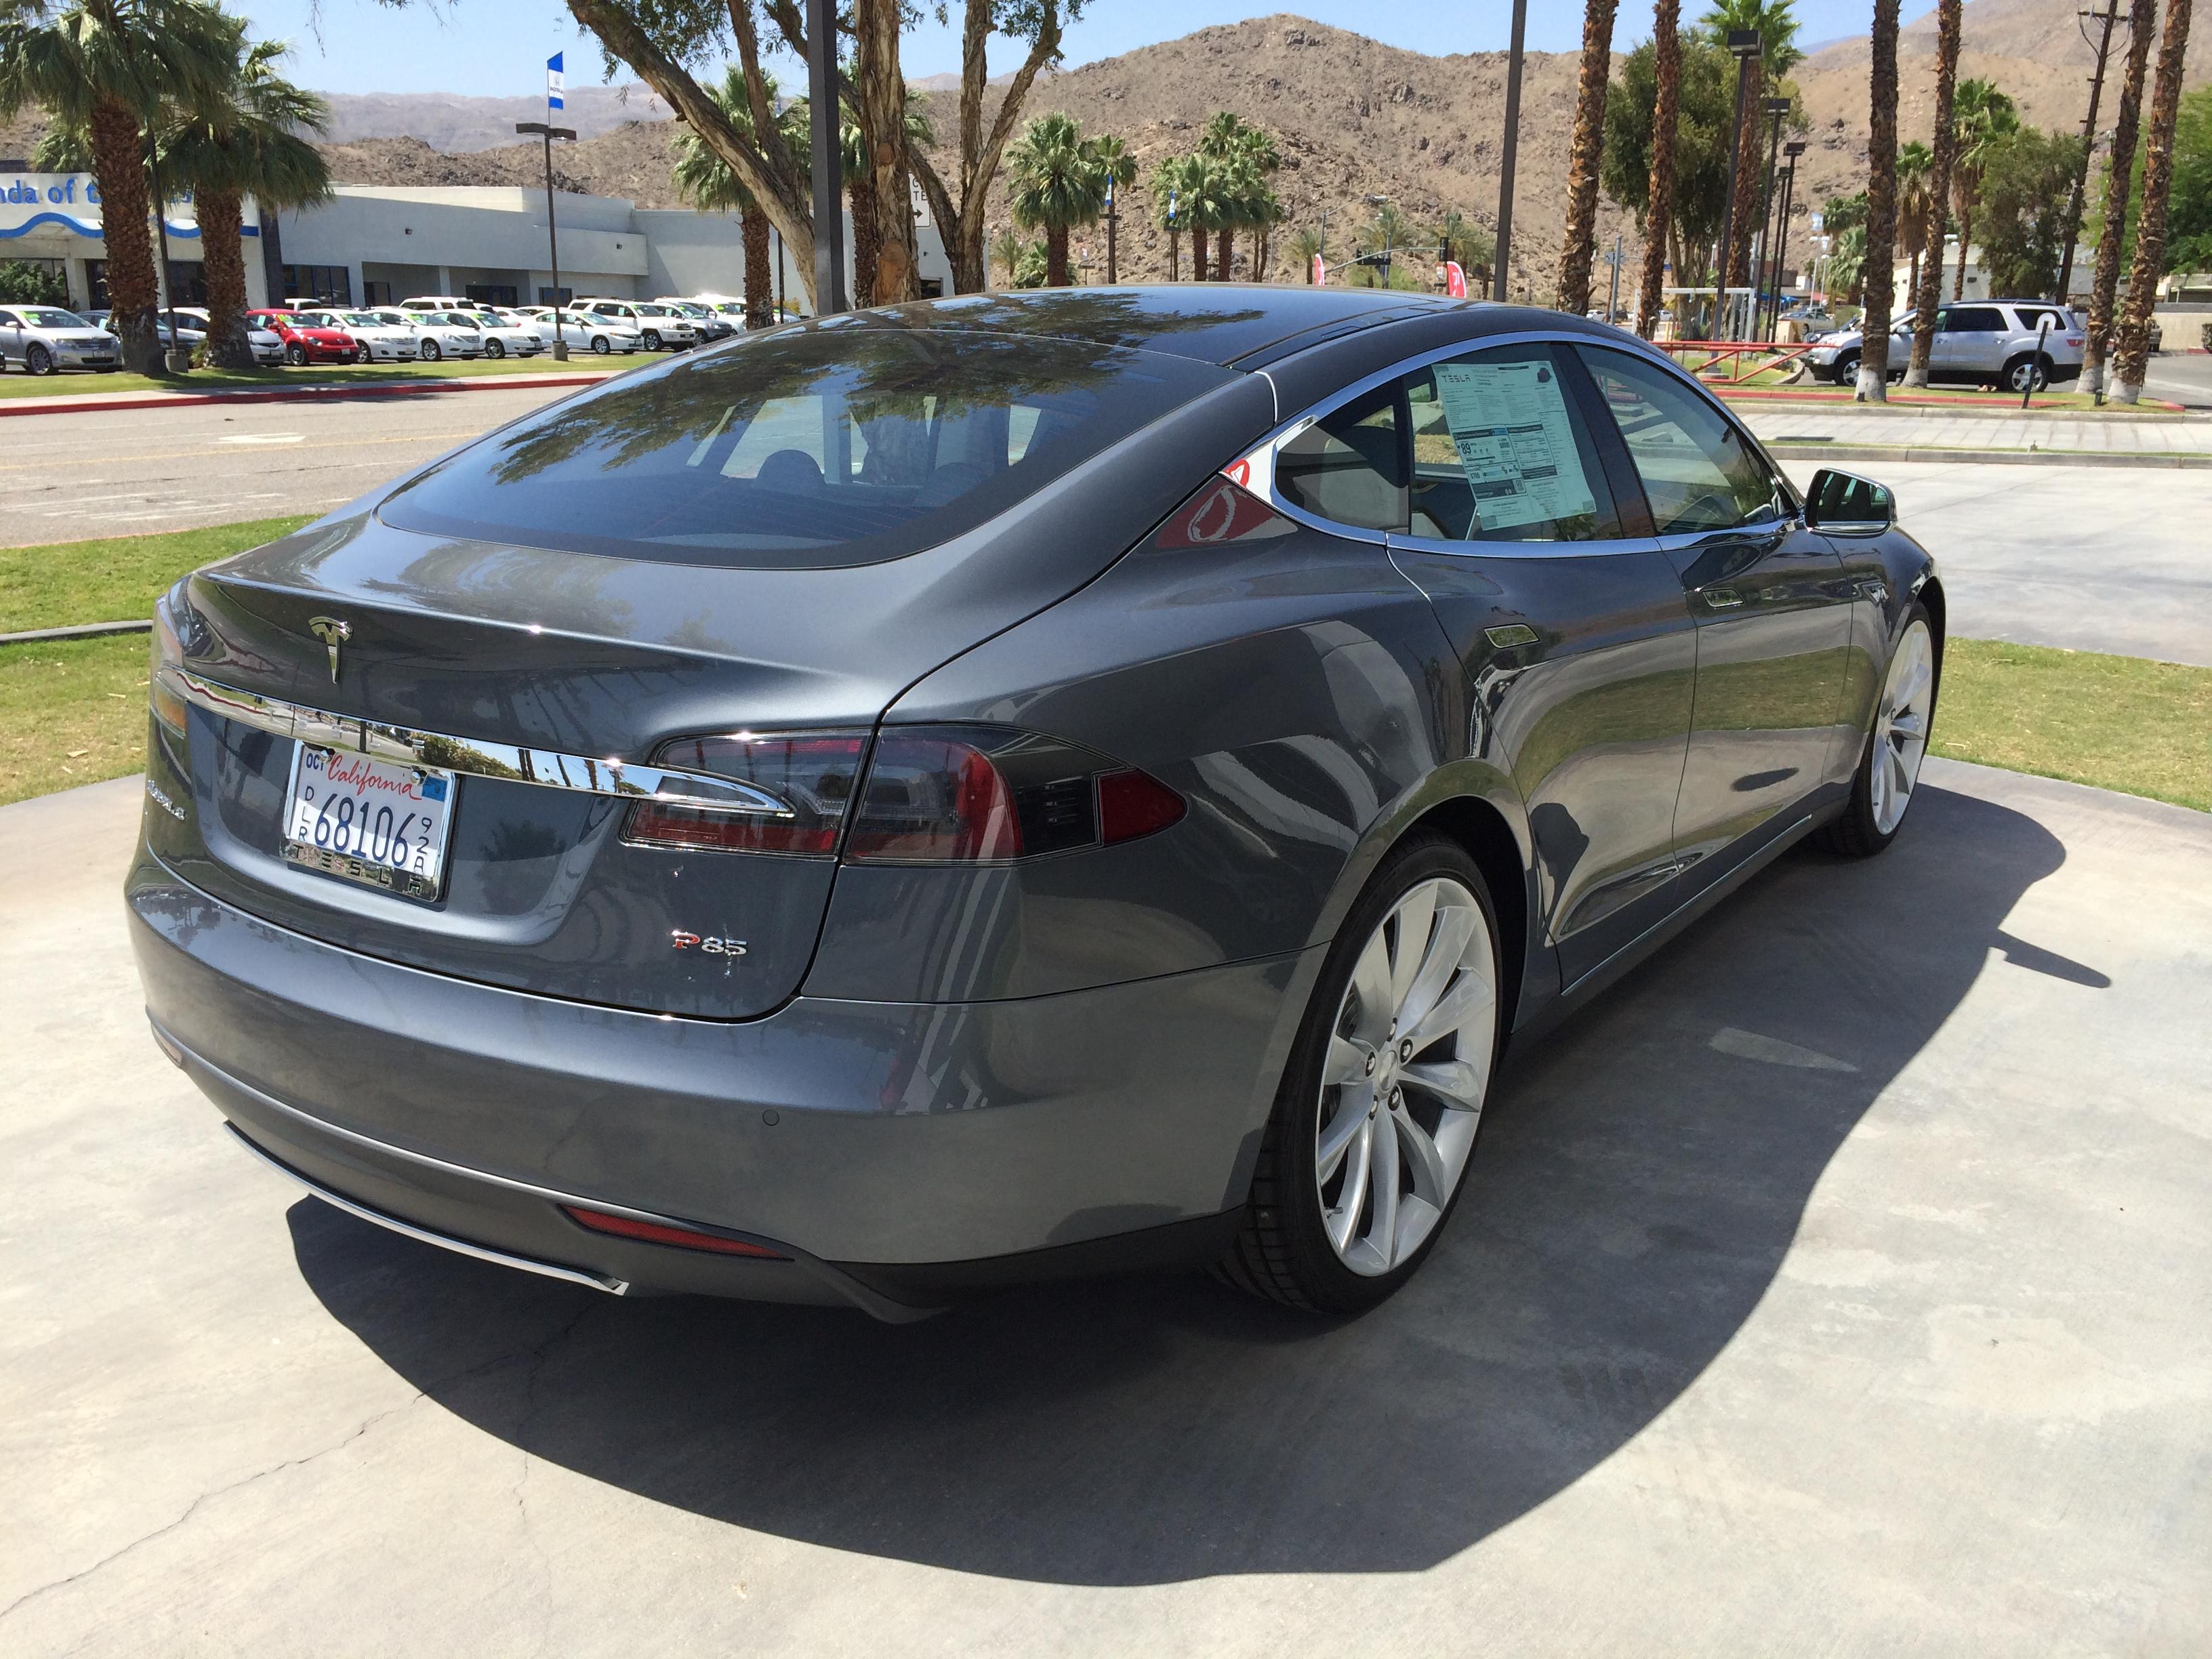 Tesla Model S Todd Bianco S Acarisnotarefrigerator Com Blog